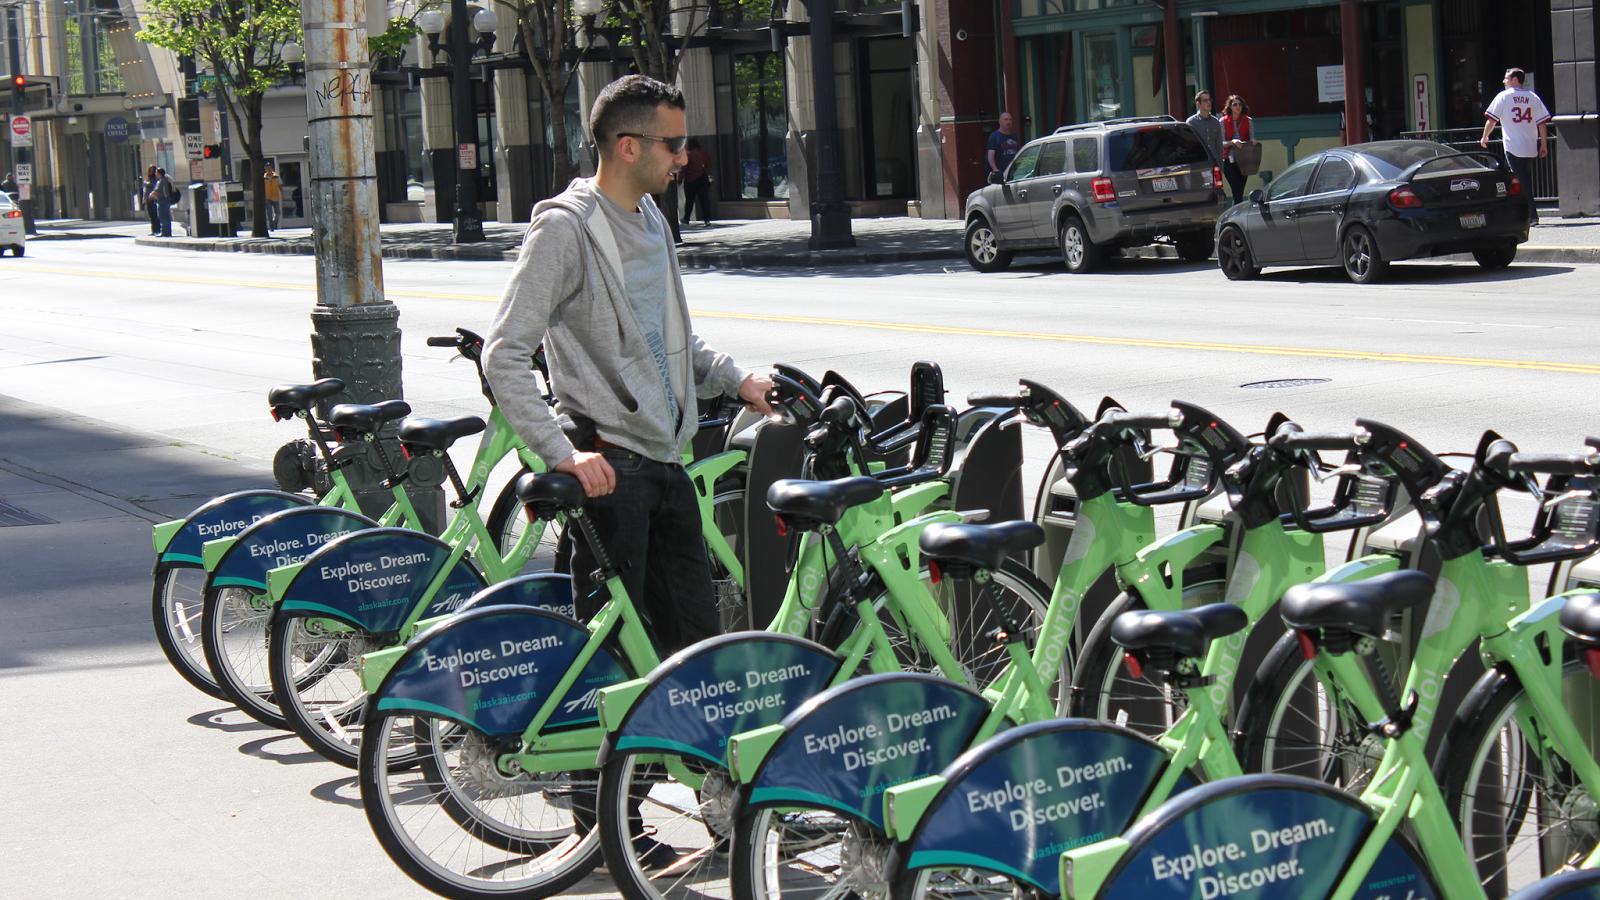 Bike Shares Have a Better Safety Record Than Regular City Biking